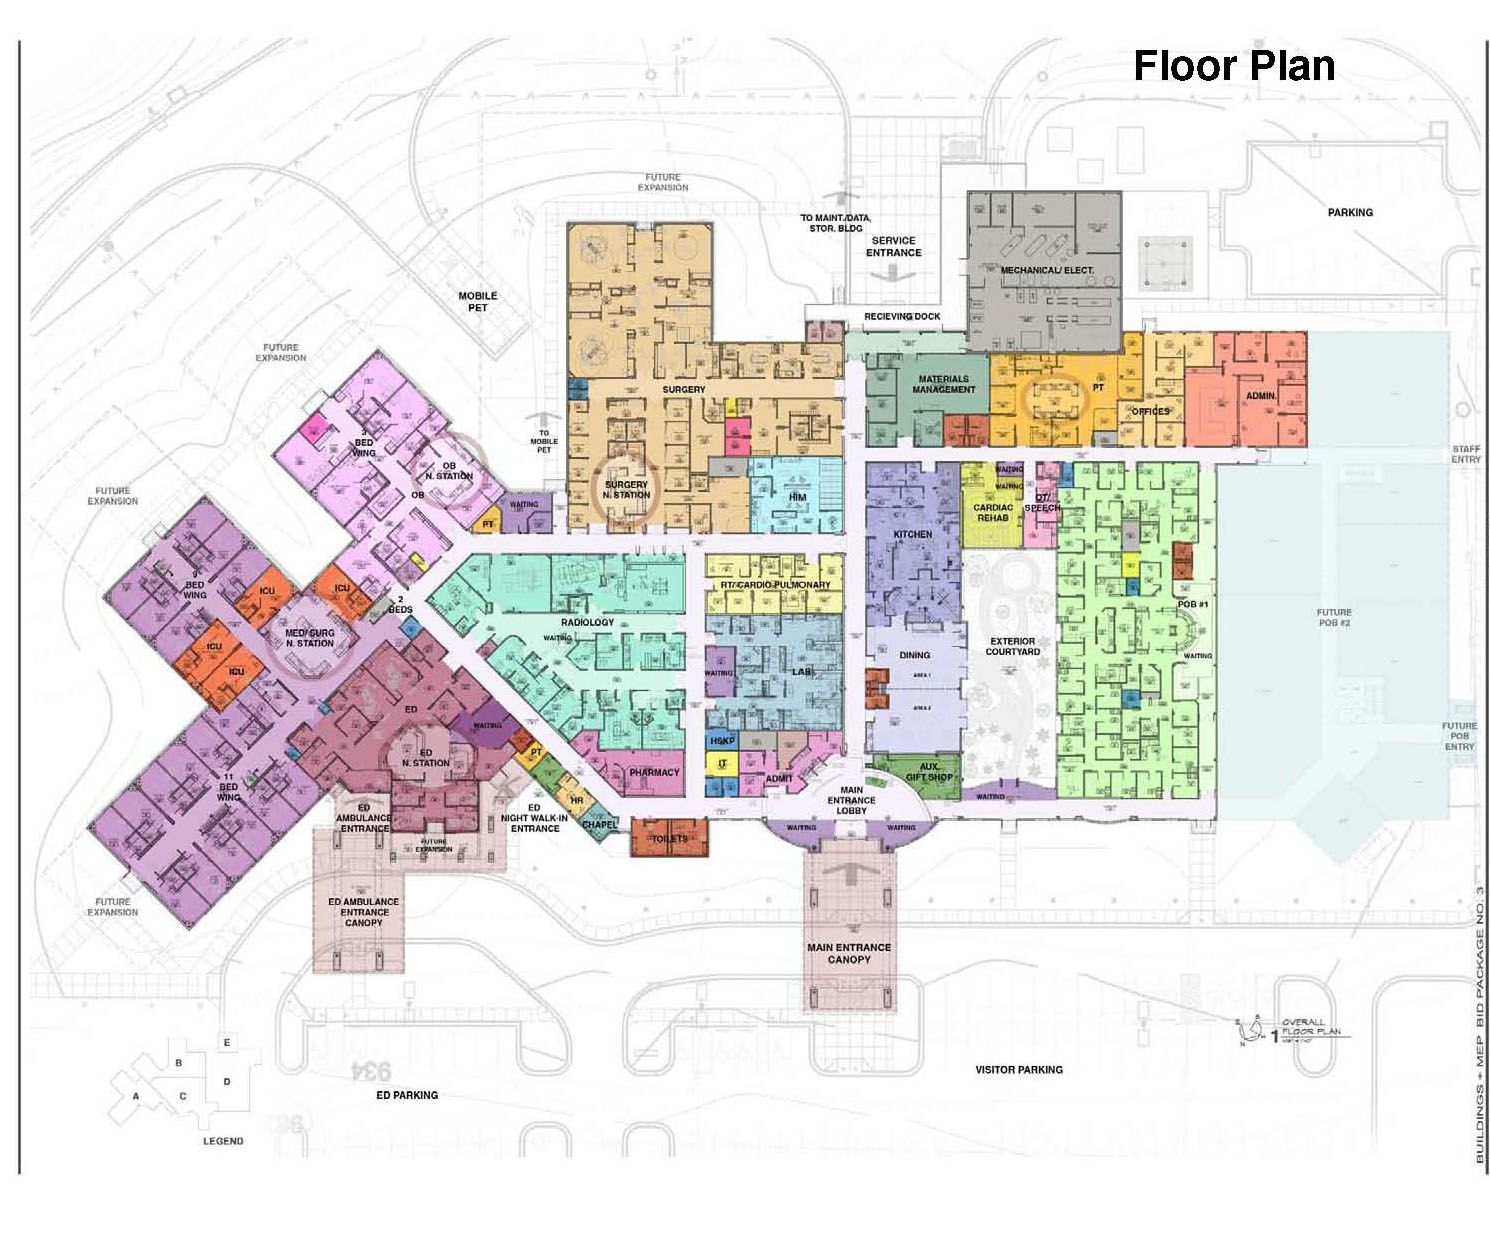 Hospital Floor Plans Home Plans Hospital Floor Plan Hospital Design Design